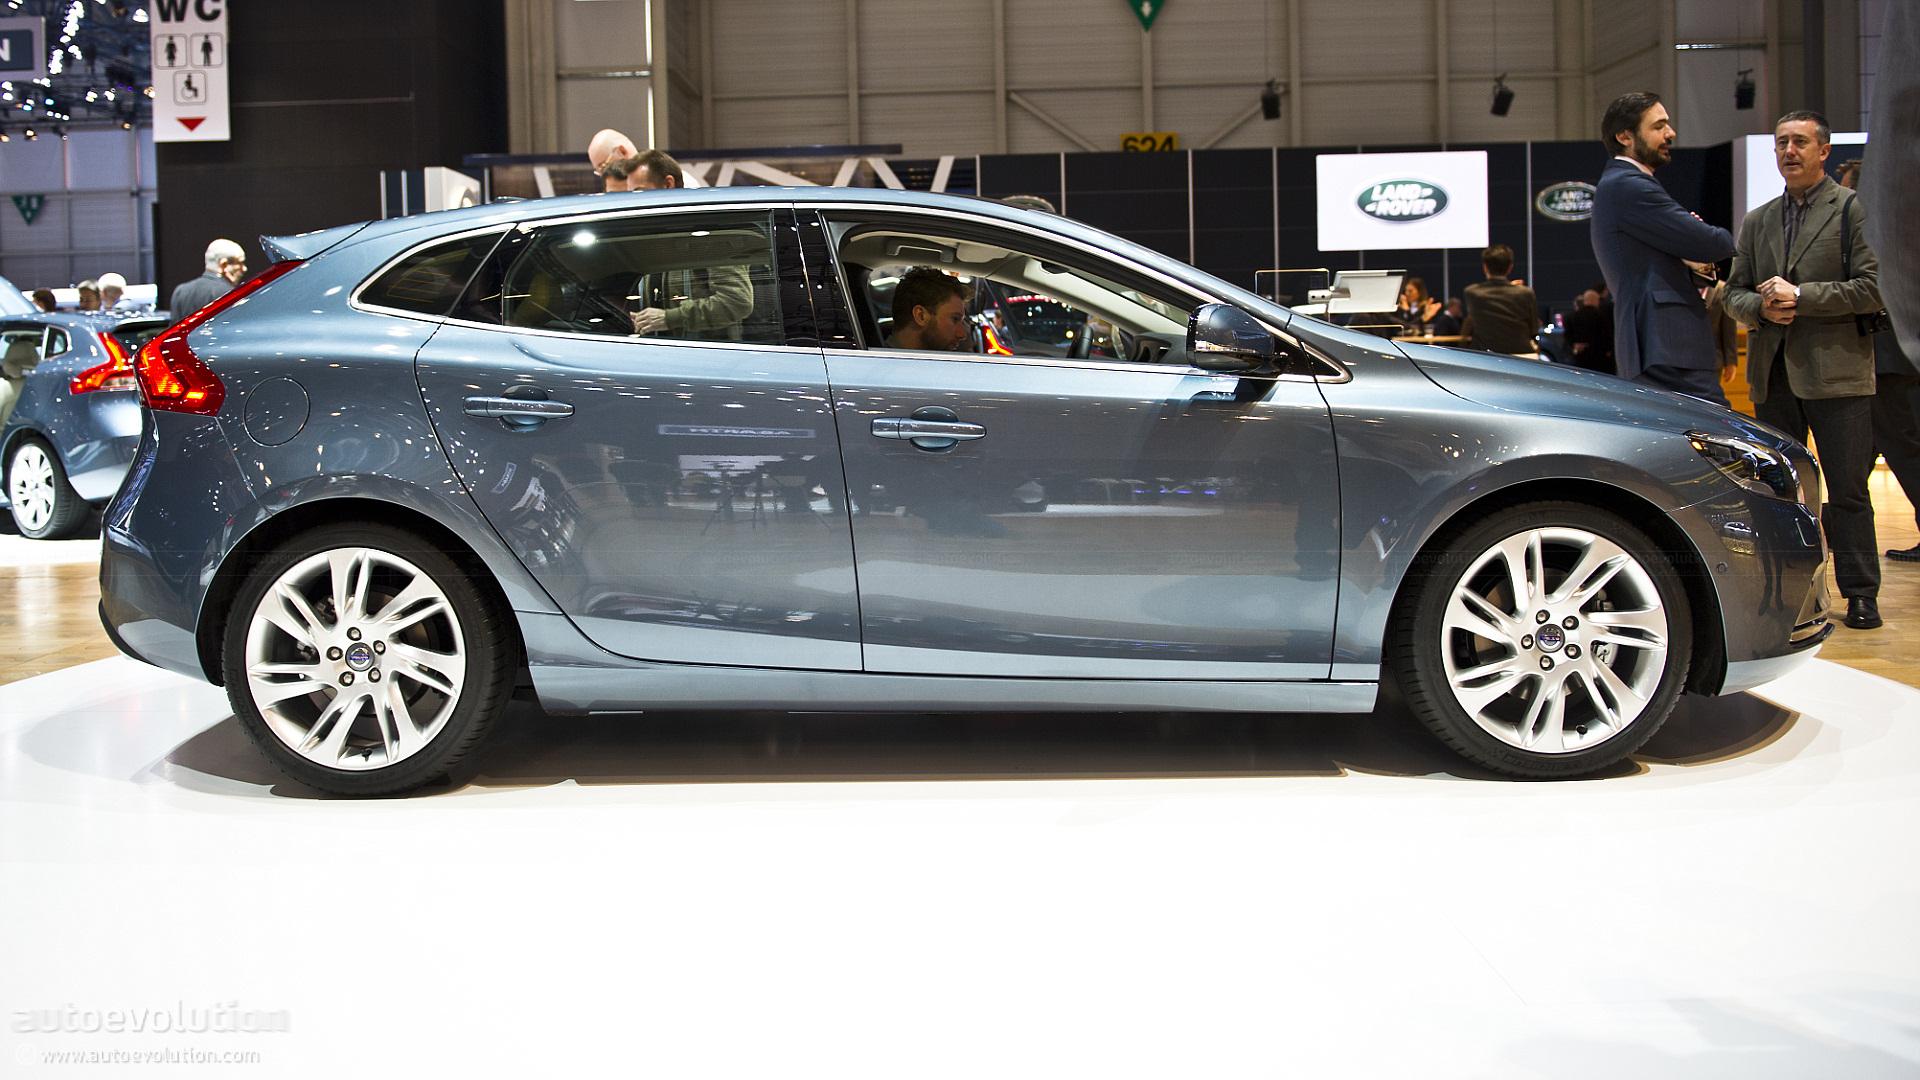 Geneva 2012: Volvo V40 [Live Photos] - autoevolution